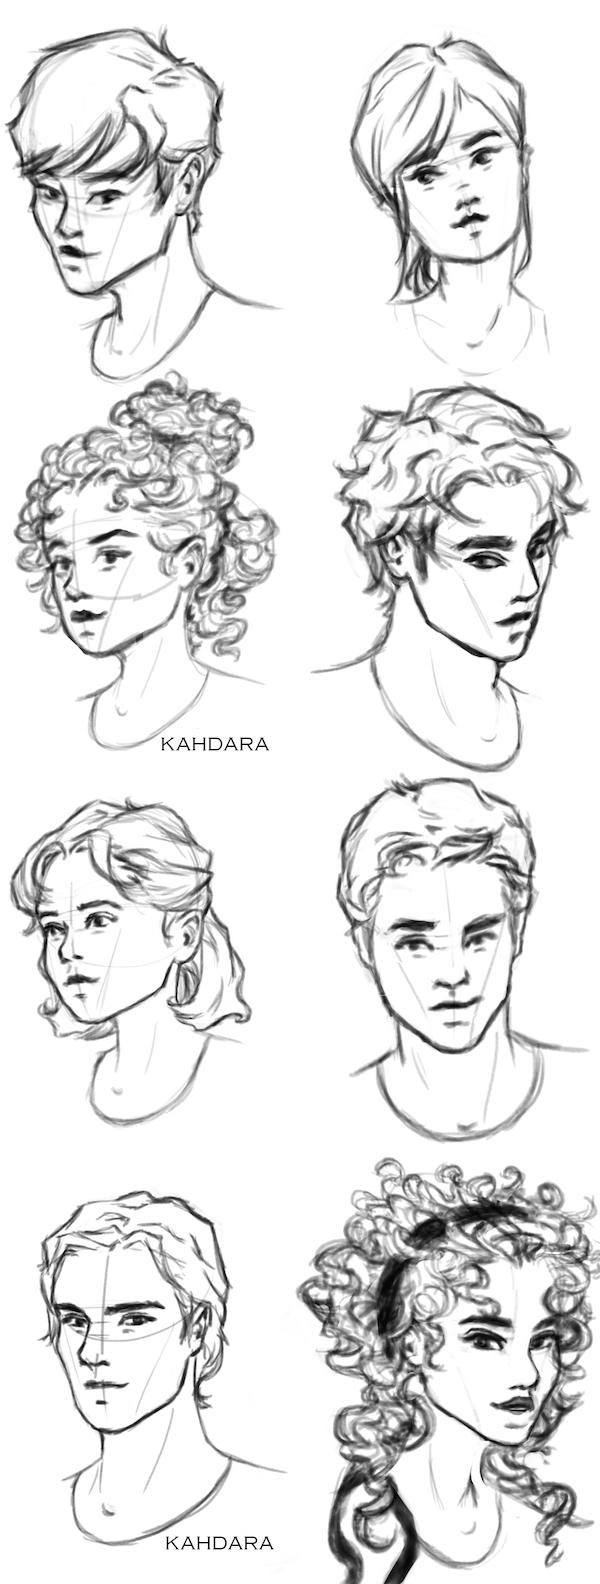 Kai, Cinder, Scarlet, Ze'ev/Wolf, Cress, Thorne, Jacin and